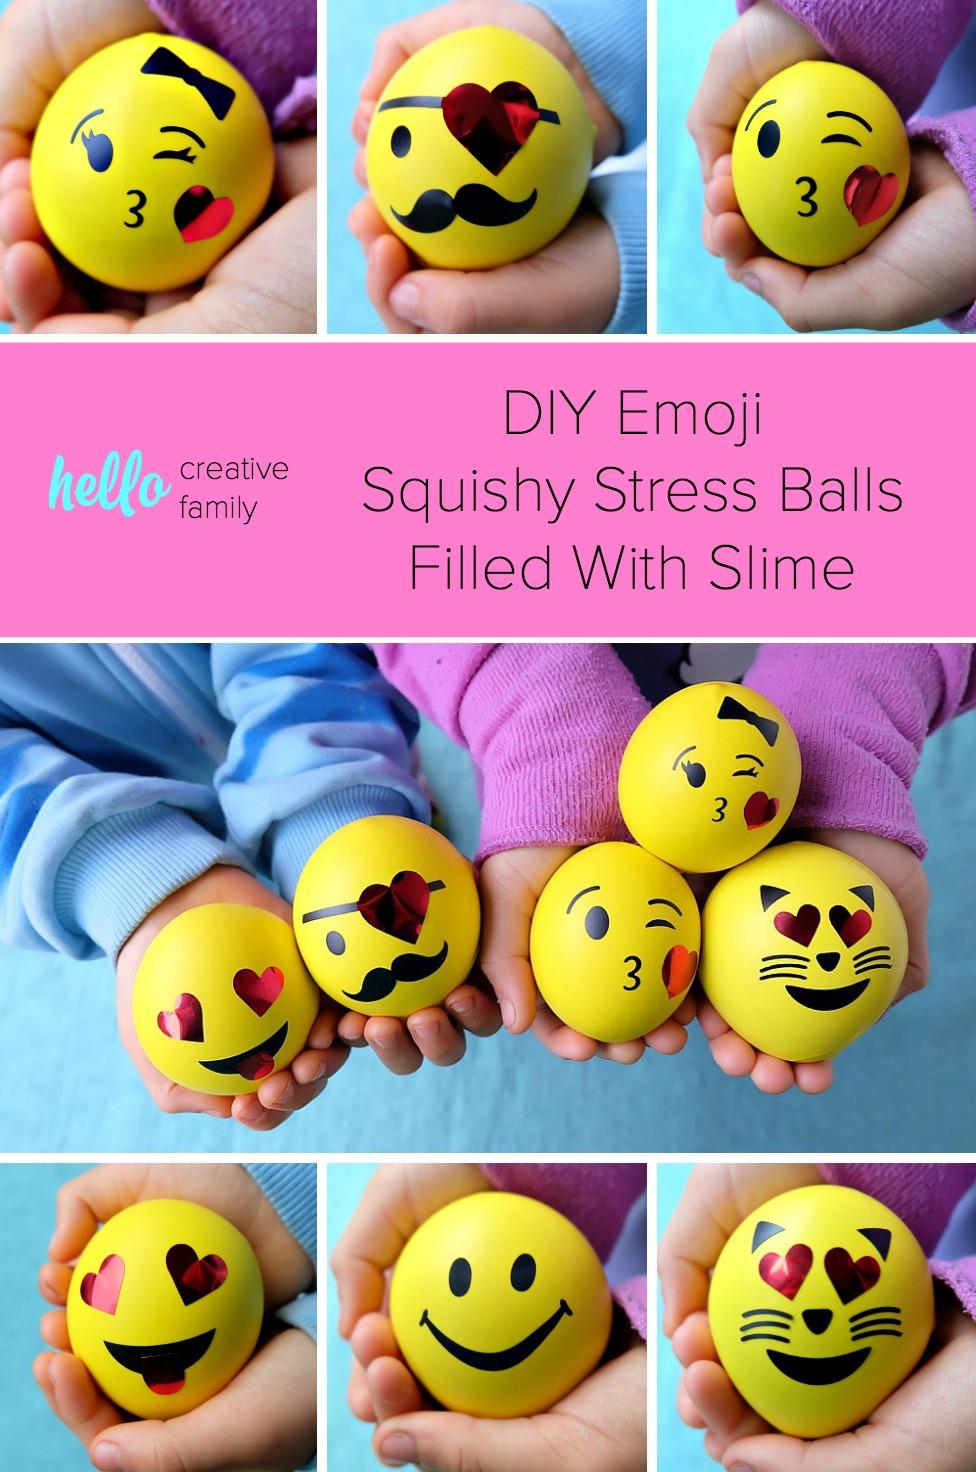 Squishy Foam And Stress Ball Emoji : DIY Emoji Squishy Stress Balls Filled With Slime - Hello Creative Family